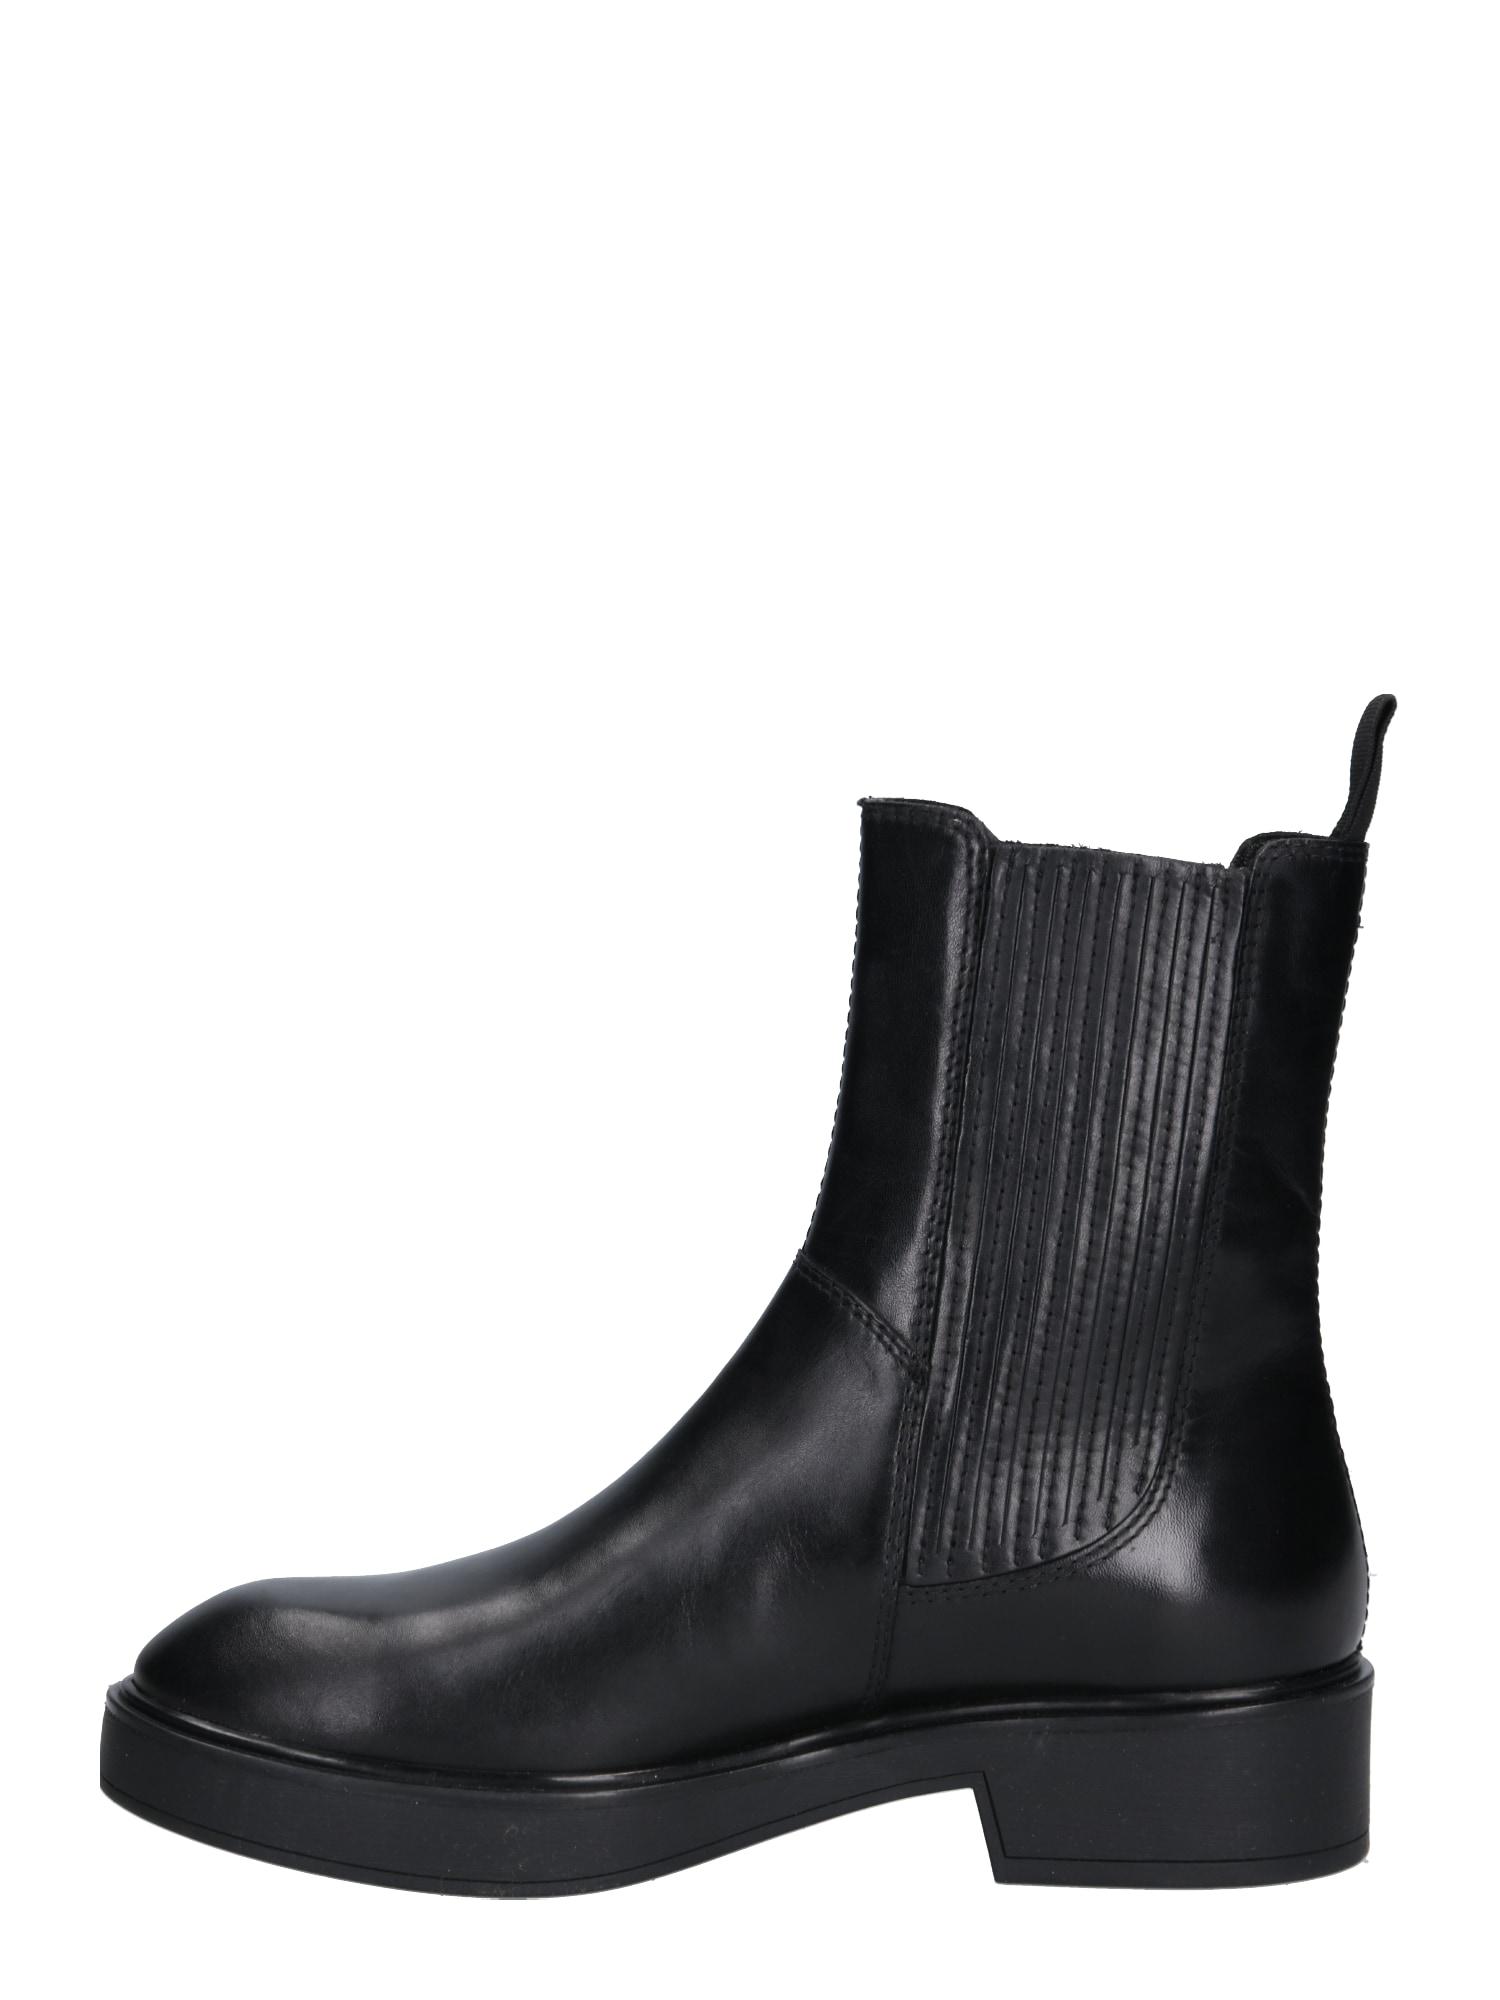 vagabond shoemakers - Stiefel 'Diane'